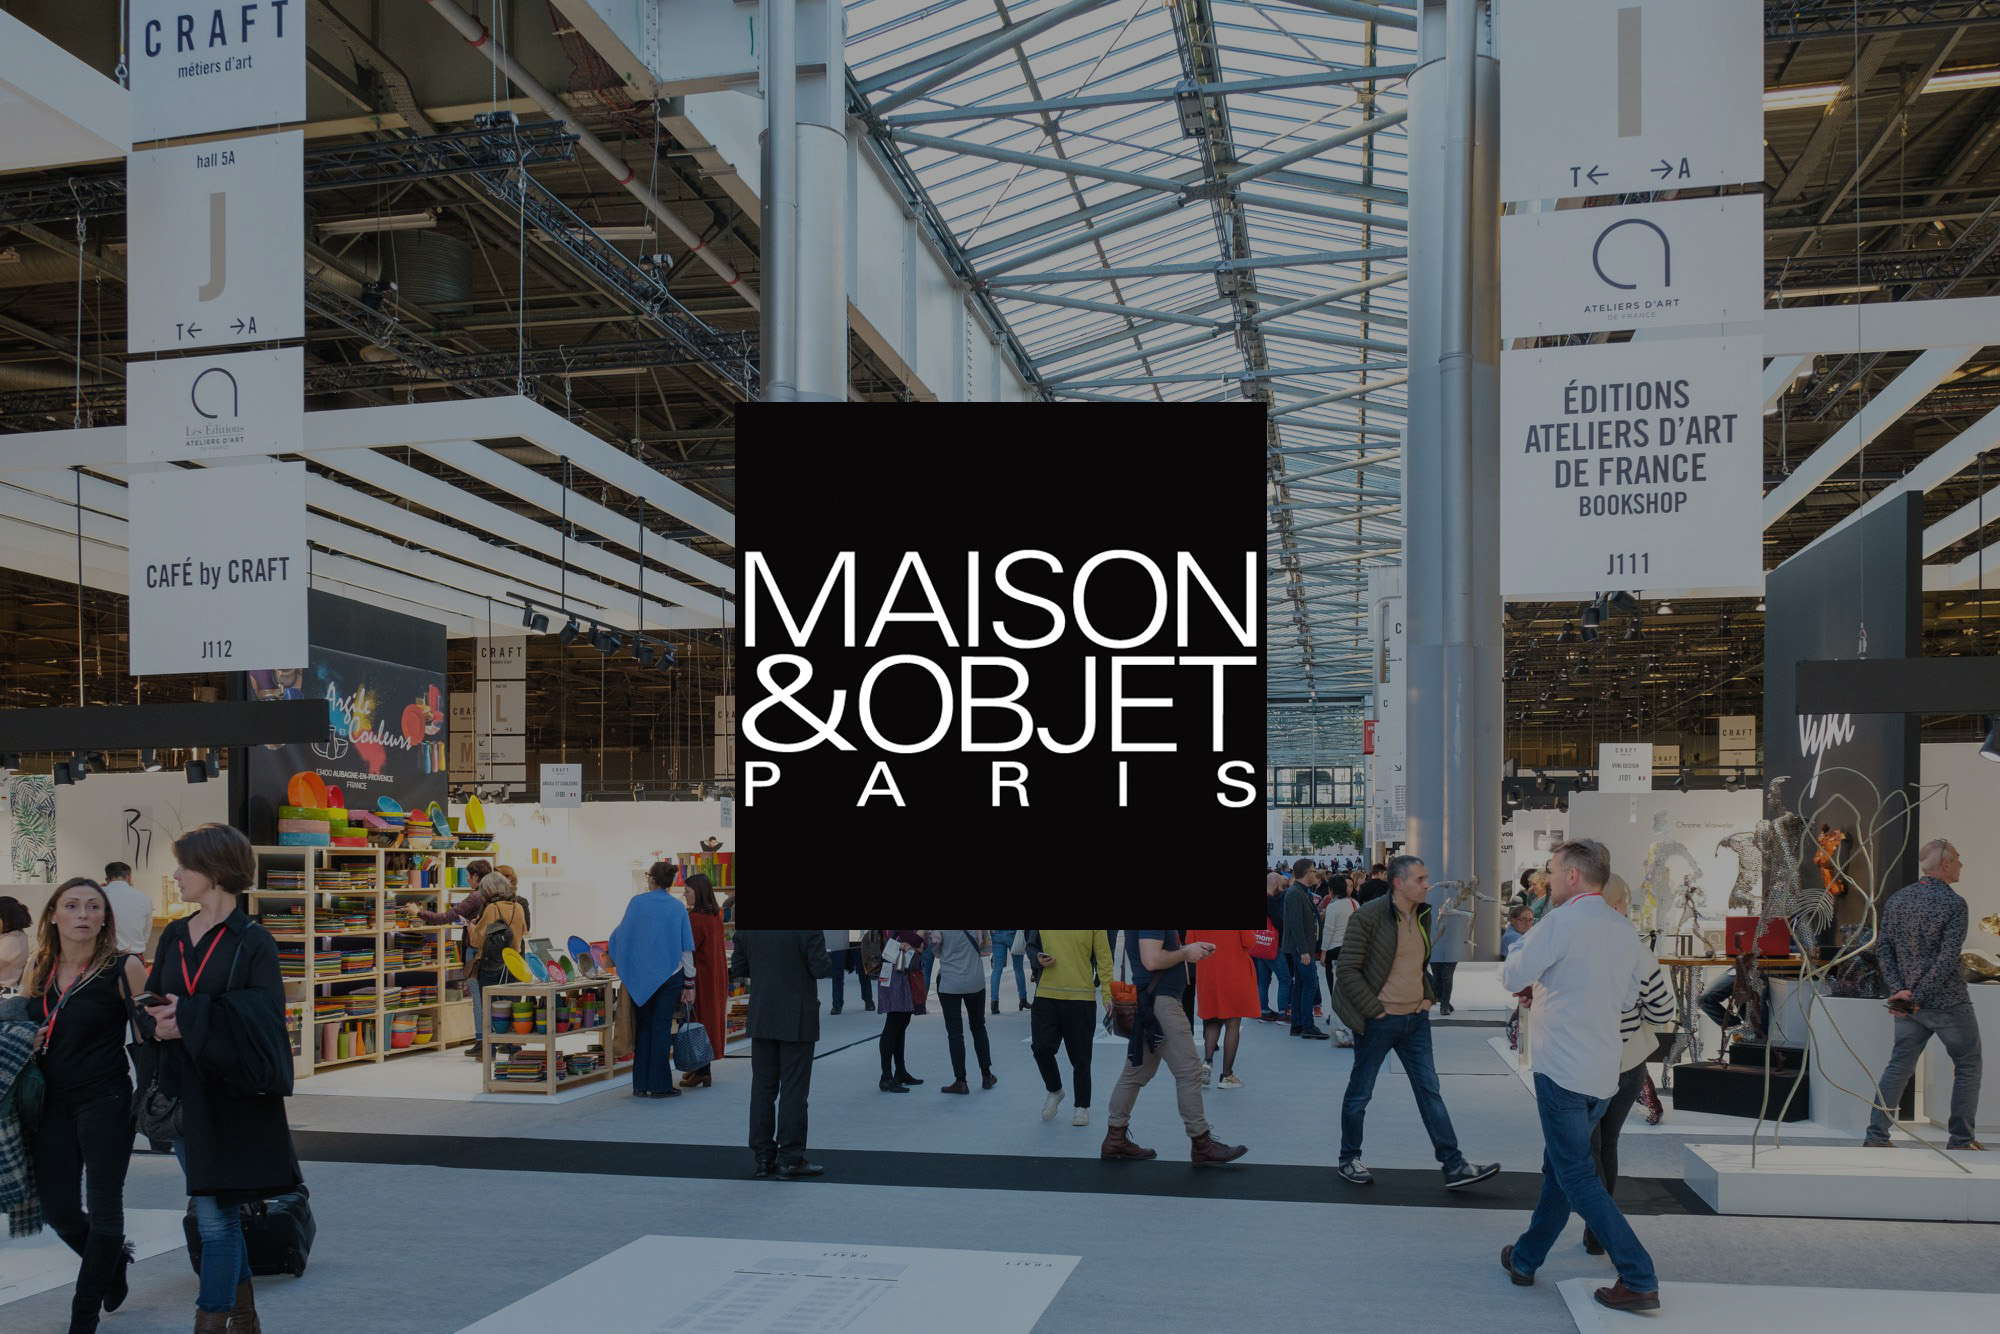 Maison & Objet September 2019 image feature on SBID interior design blog